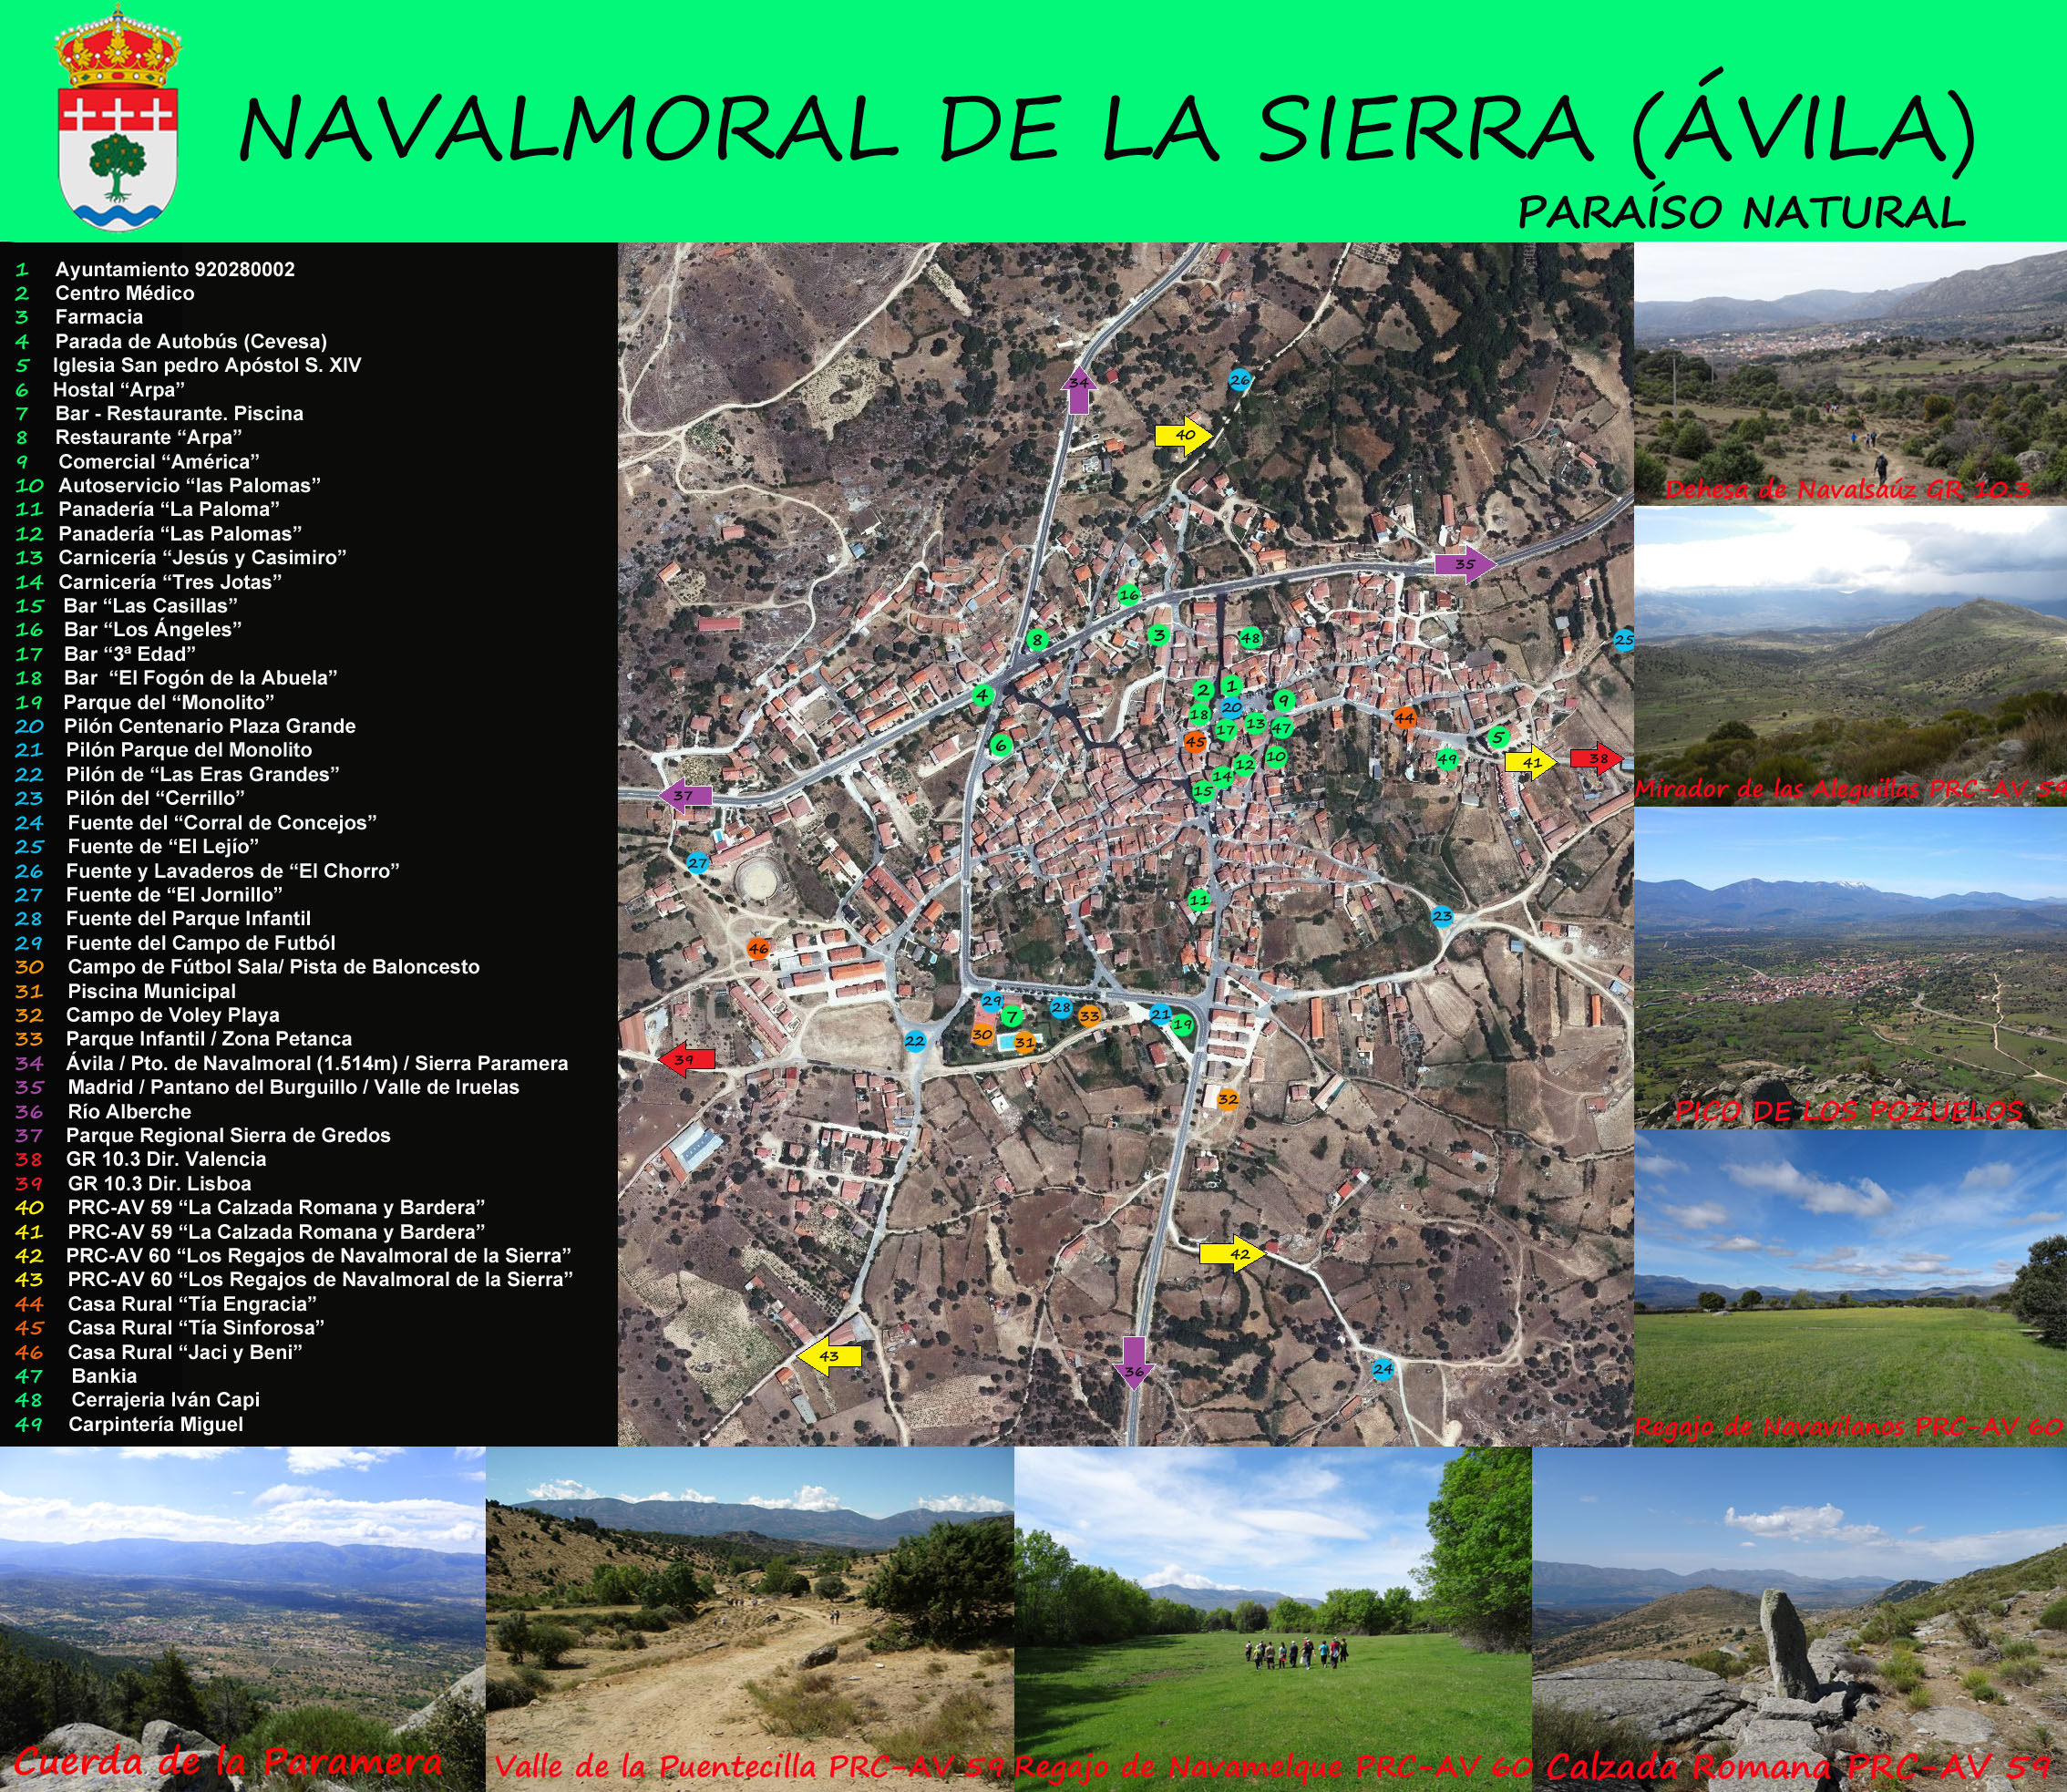 Navalmoral de la sierra vila zona para campamentos la - Navalmoral de la sierra ...